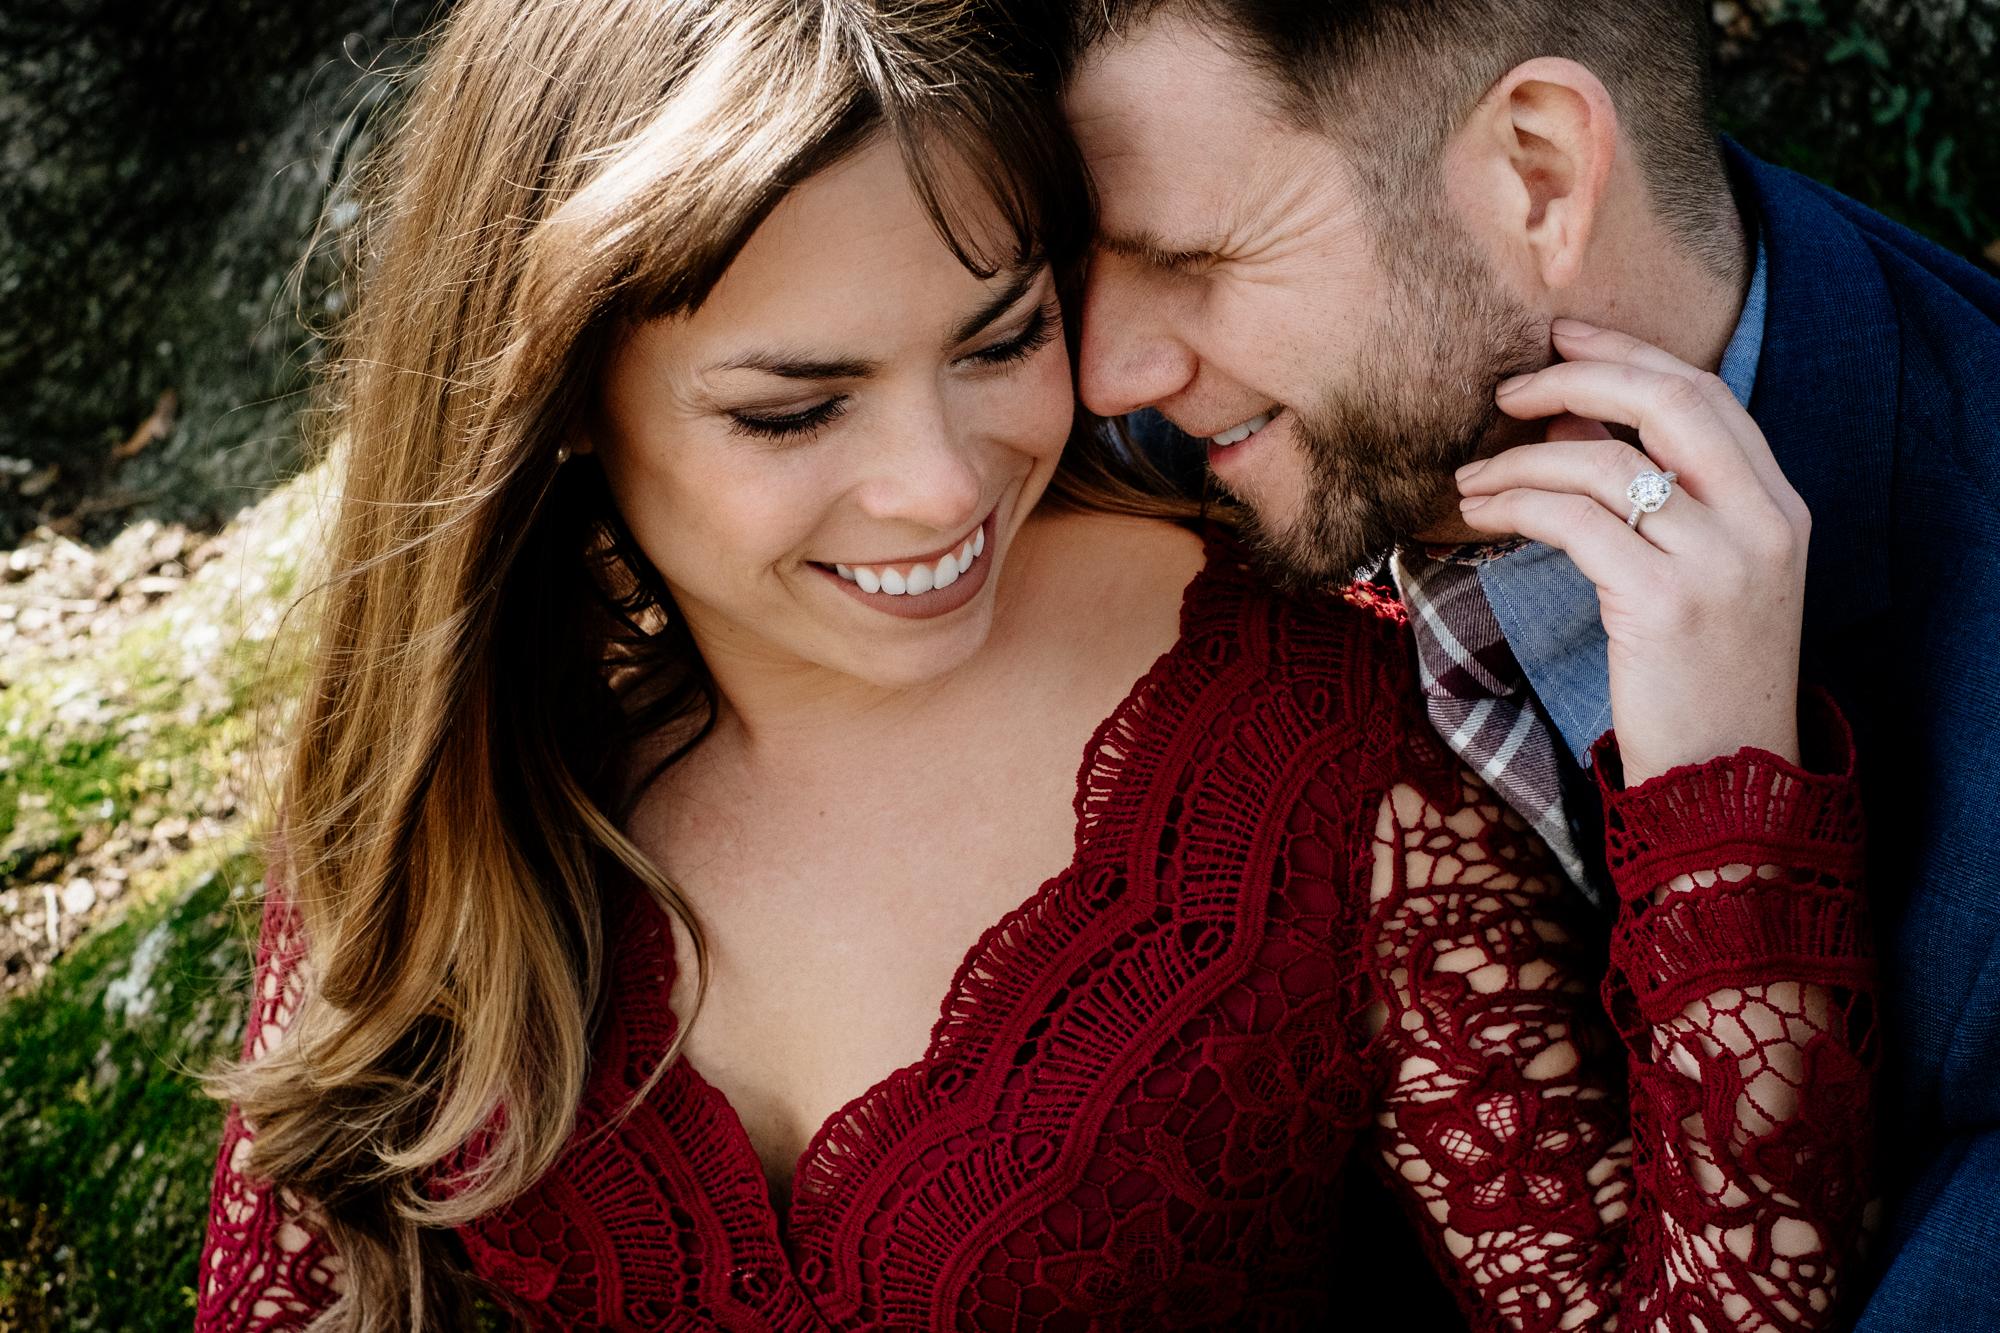 Jen_Montgomery_Photography_Angela_Brian_Engagement_Proposal_FB-149.jpg